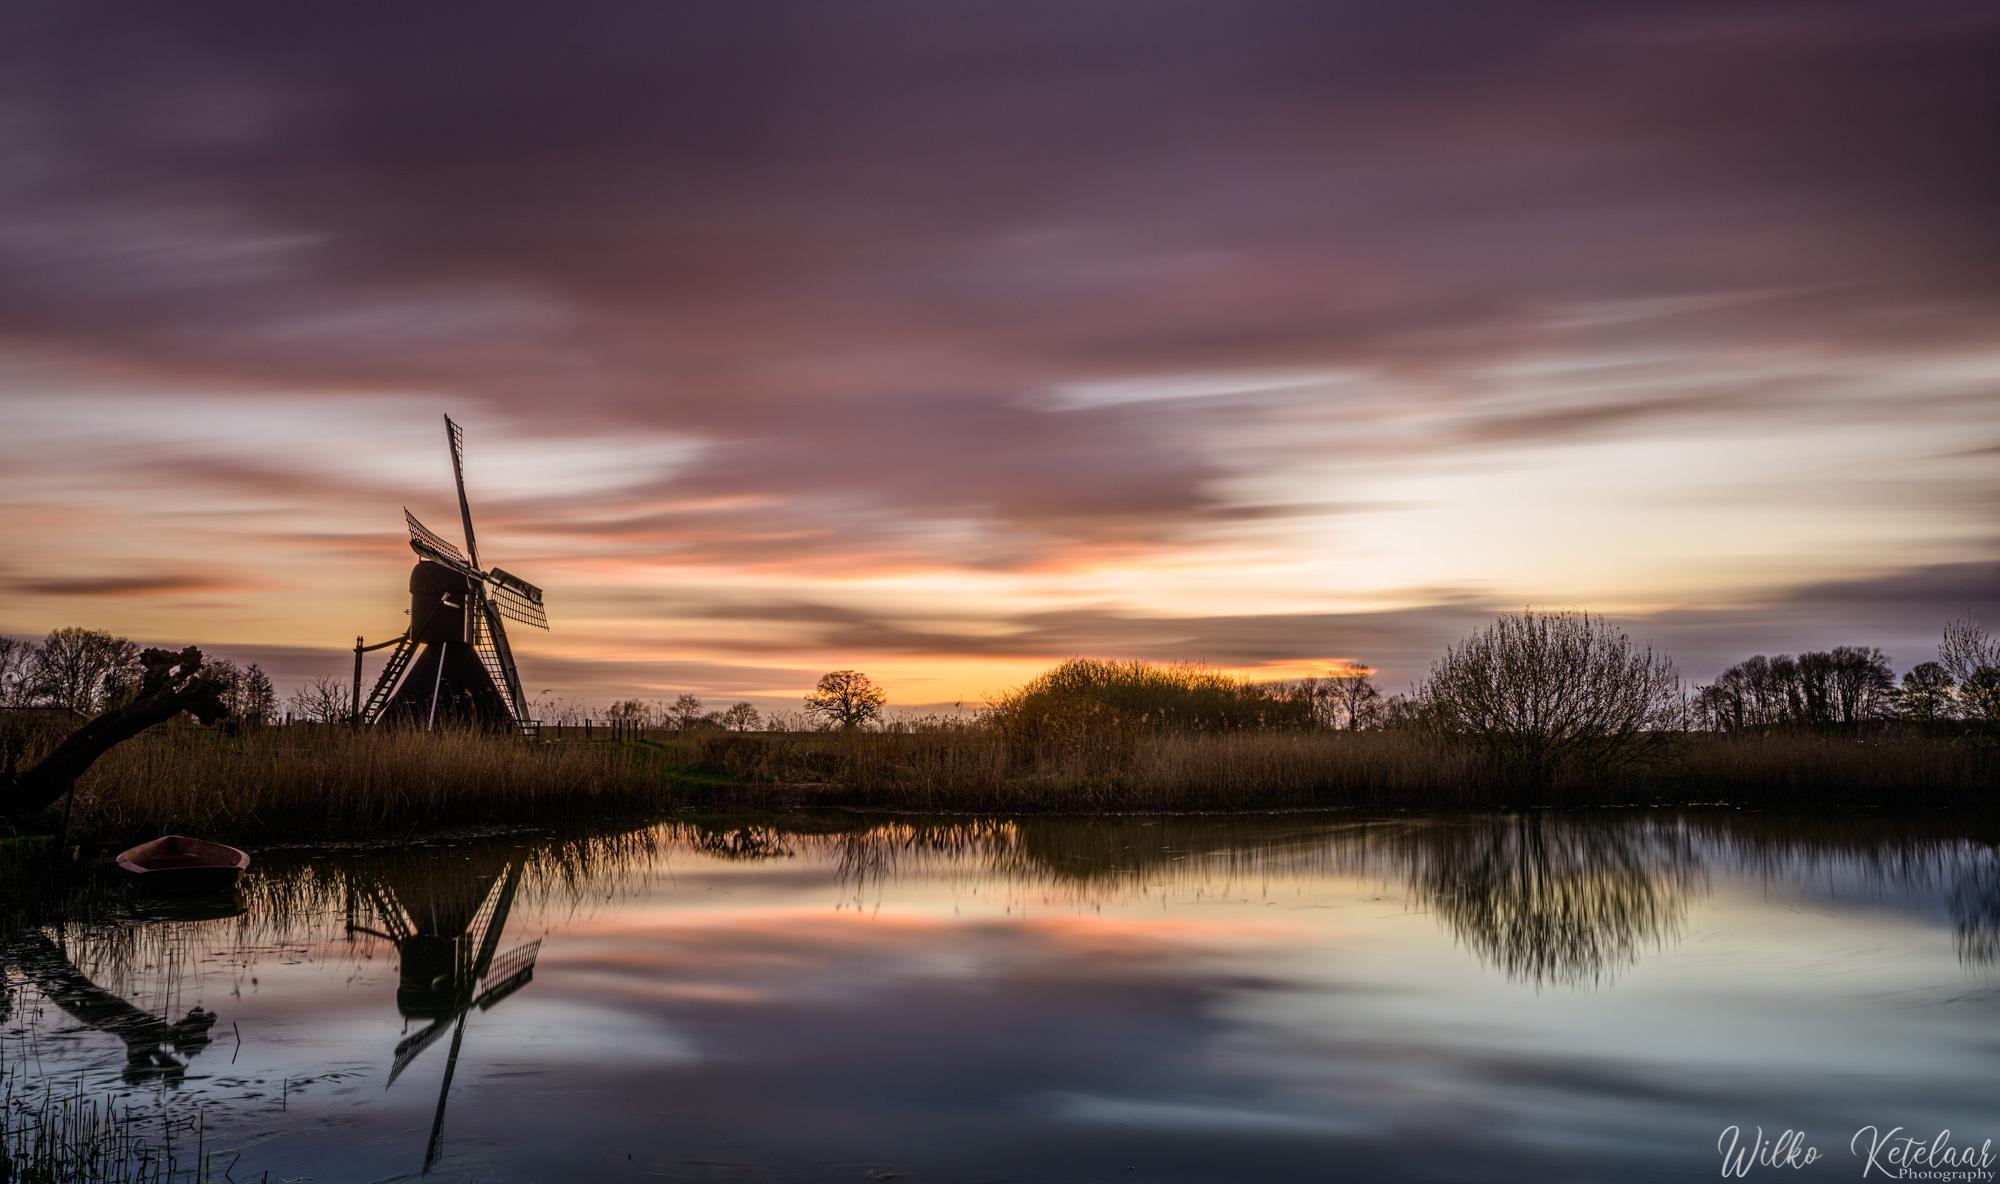 Keppelse watermill, Netherlands